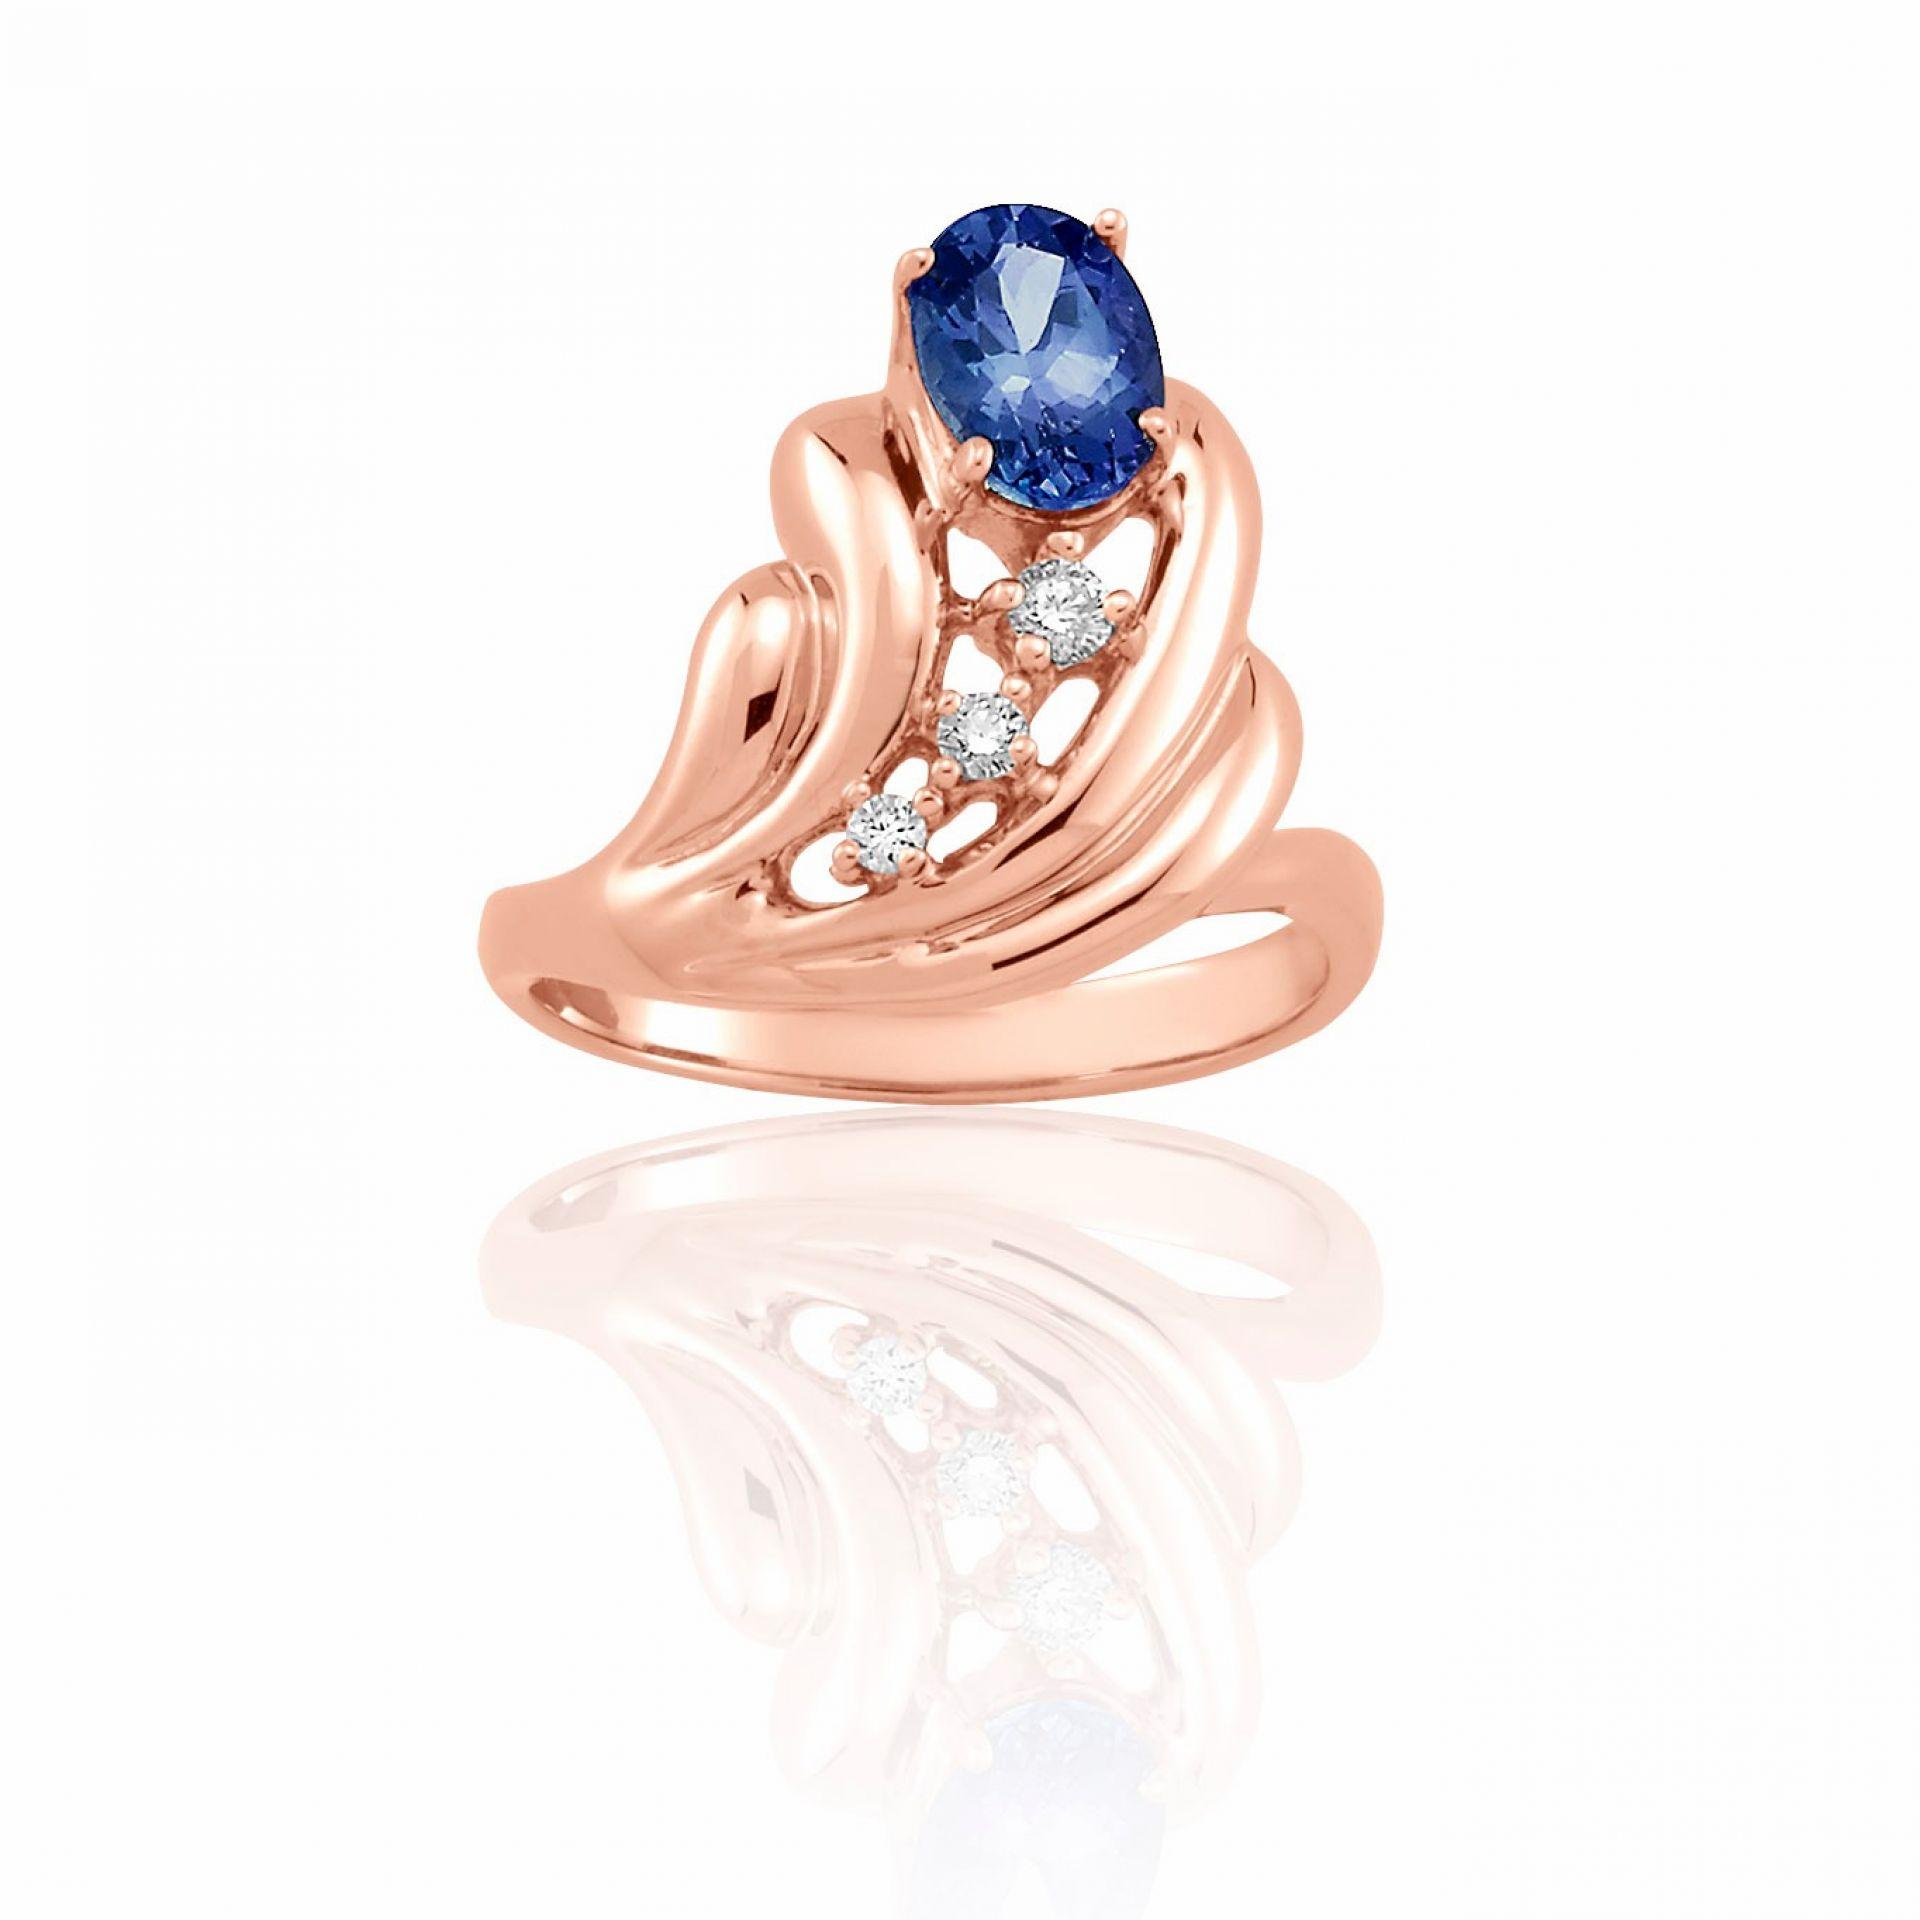 Oval Tanzanite & White Diamond Ring R106999-R